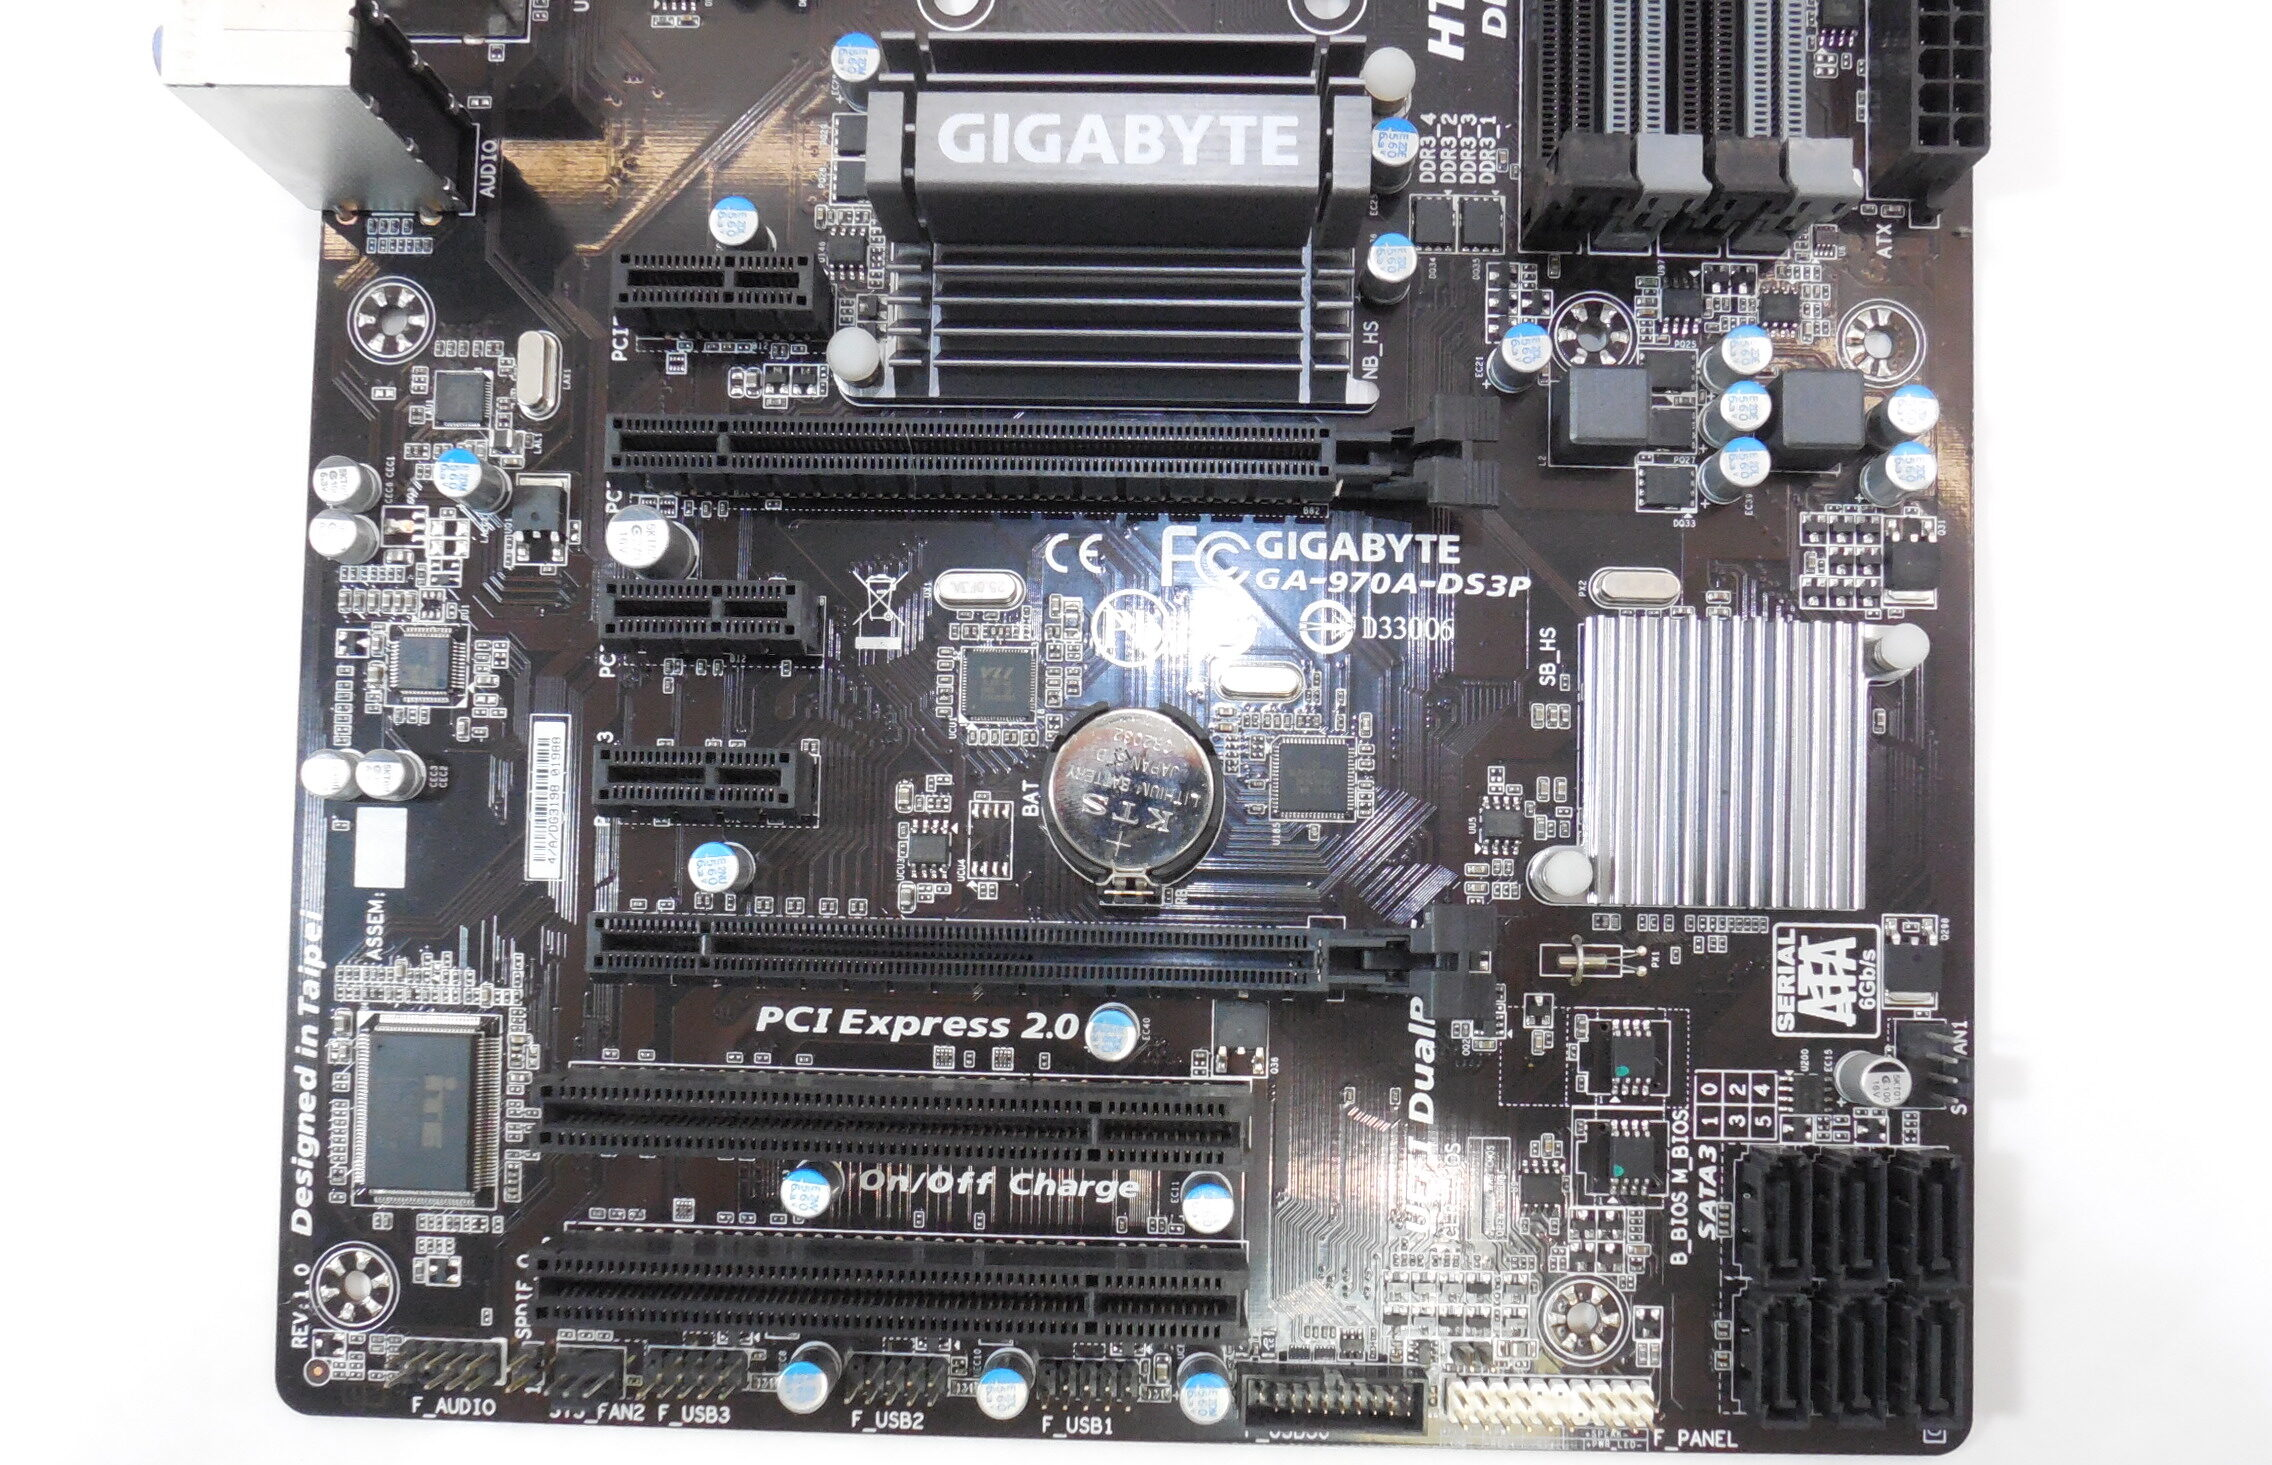 Фото платы Gigabyte GA-970A-DS3P